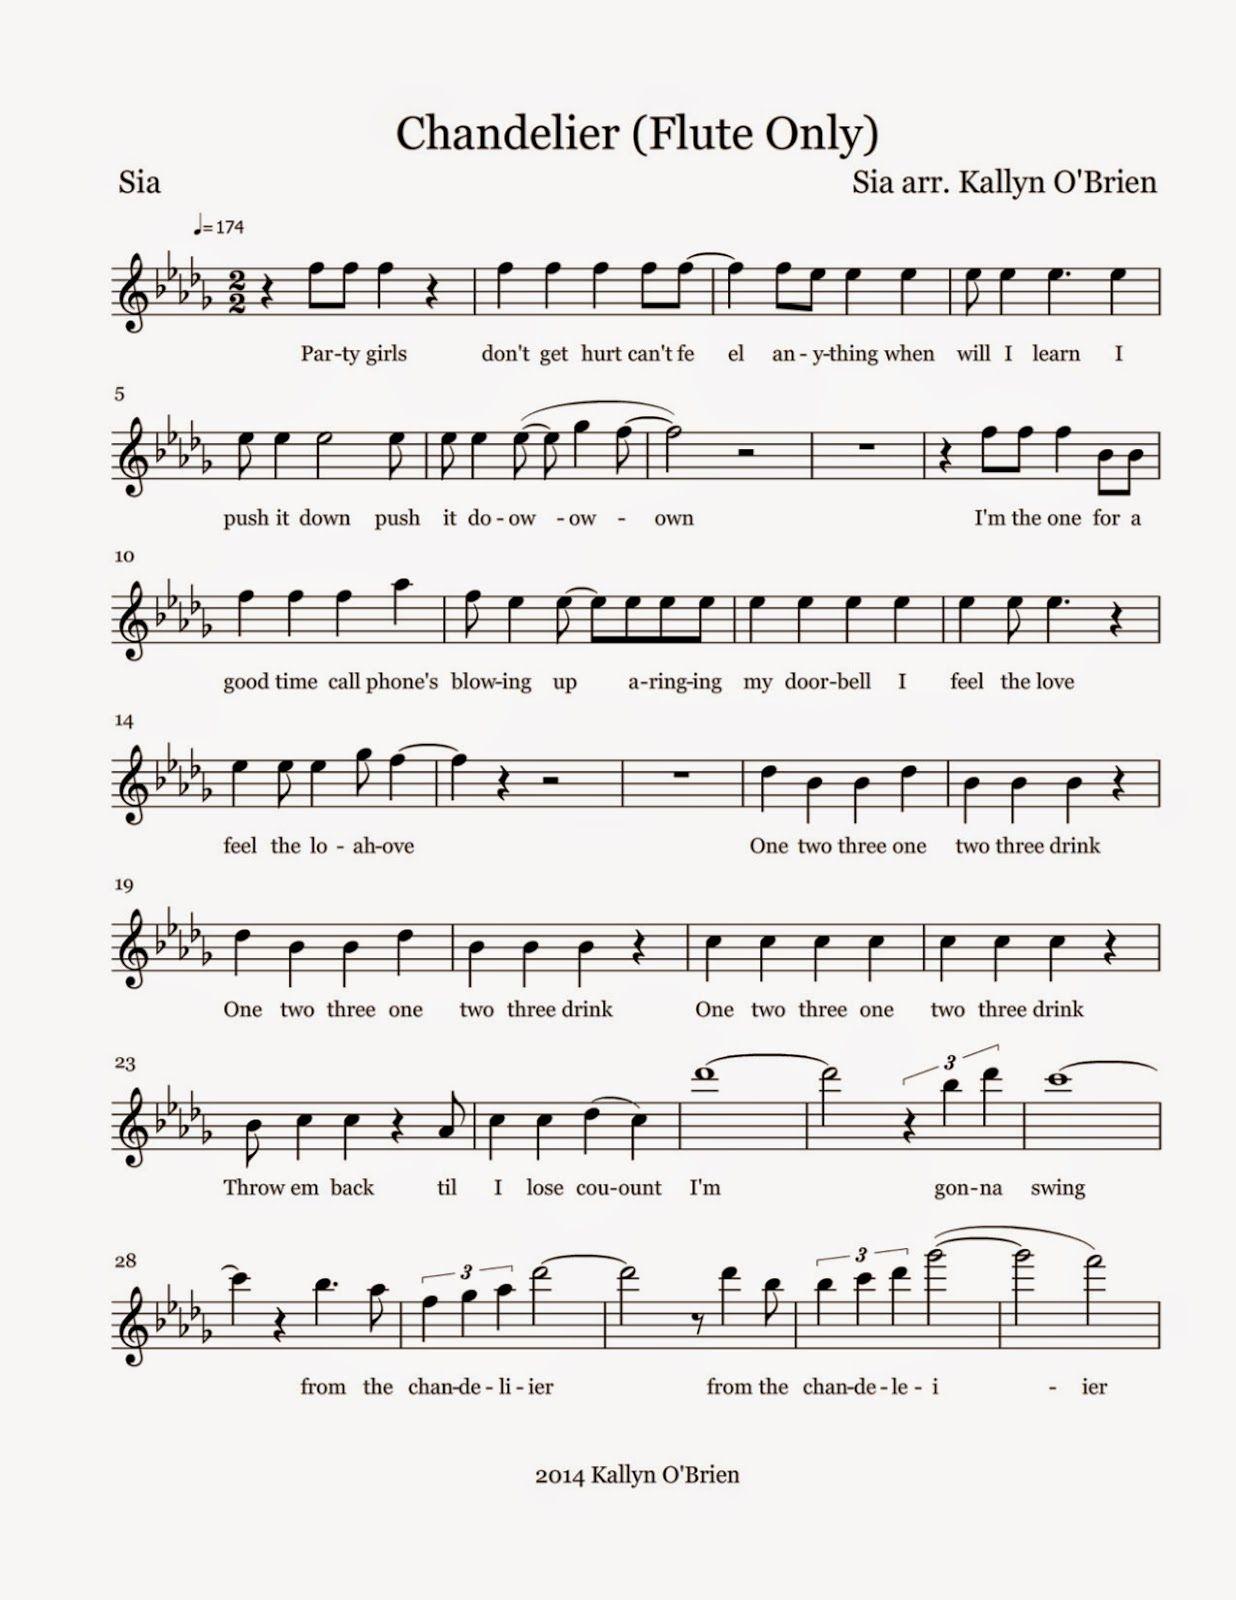 Pin by jade thane on flute music pinterest sheet music flute sheet music chandeliers chandelier lighting chandelier aloadofball Gallery